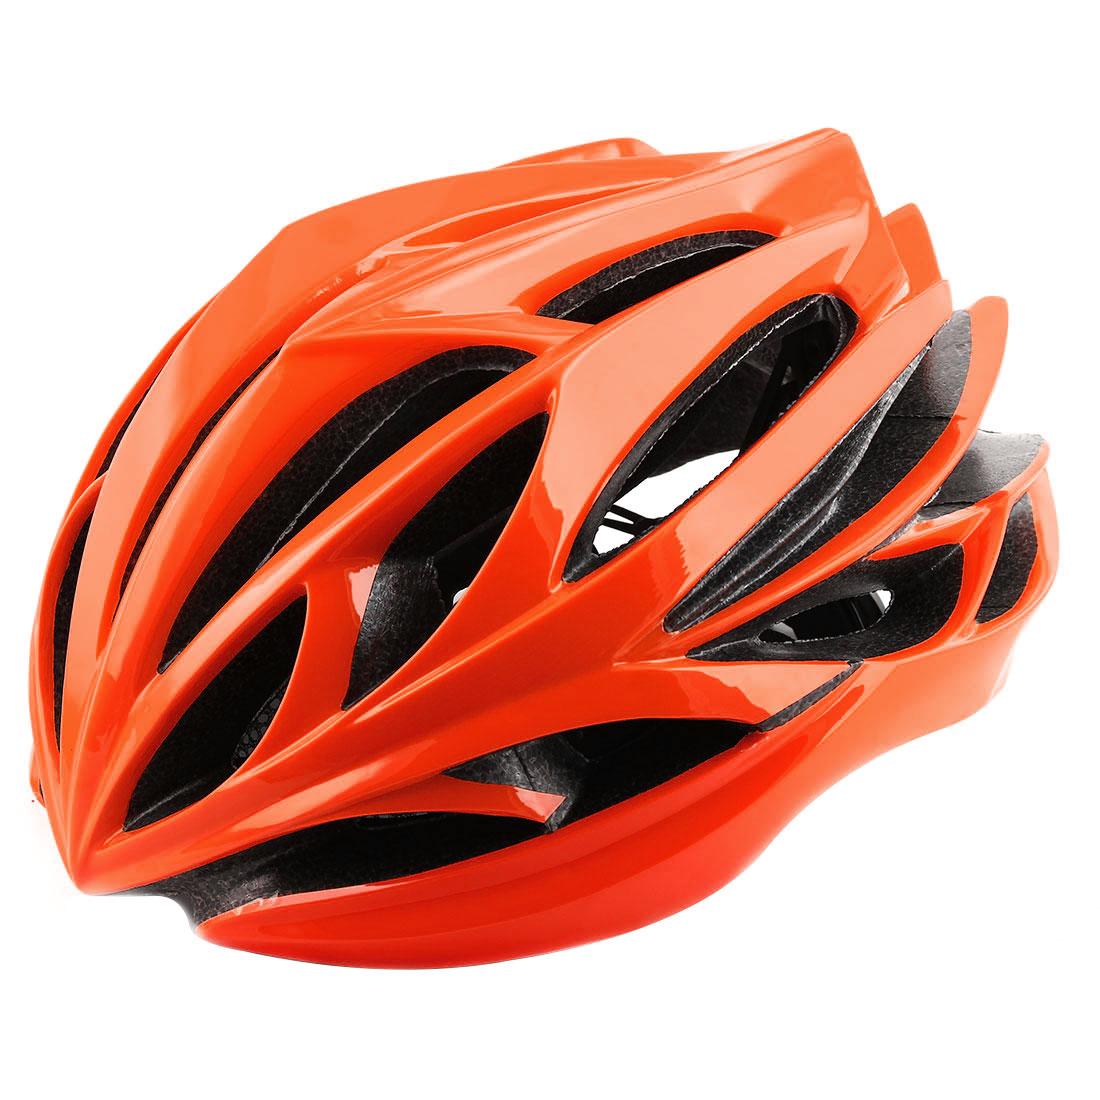 Patent Authorized Adult Unisex 22 Holes Cycling Cap Bicycle Hat Safety Protector Adjustable Bike Helmet Orange